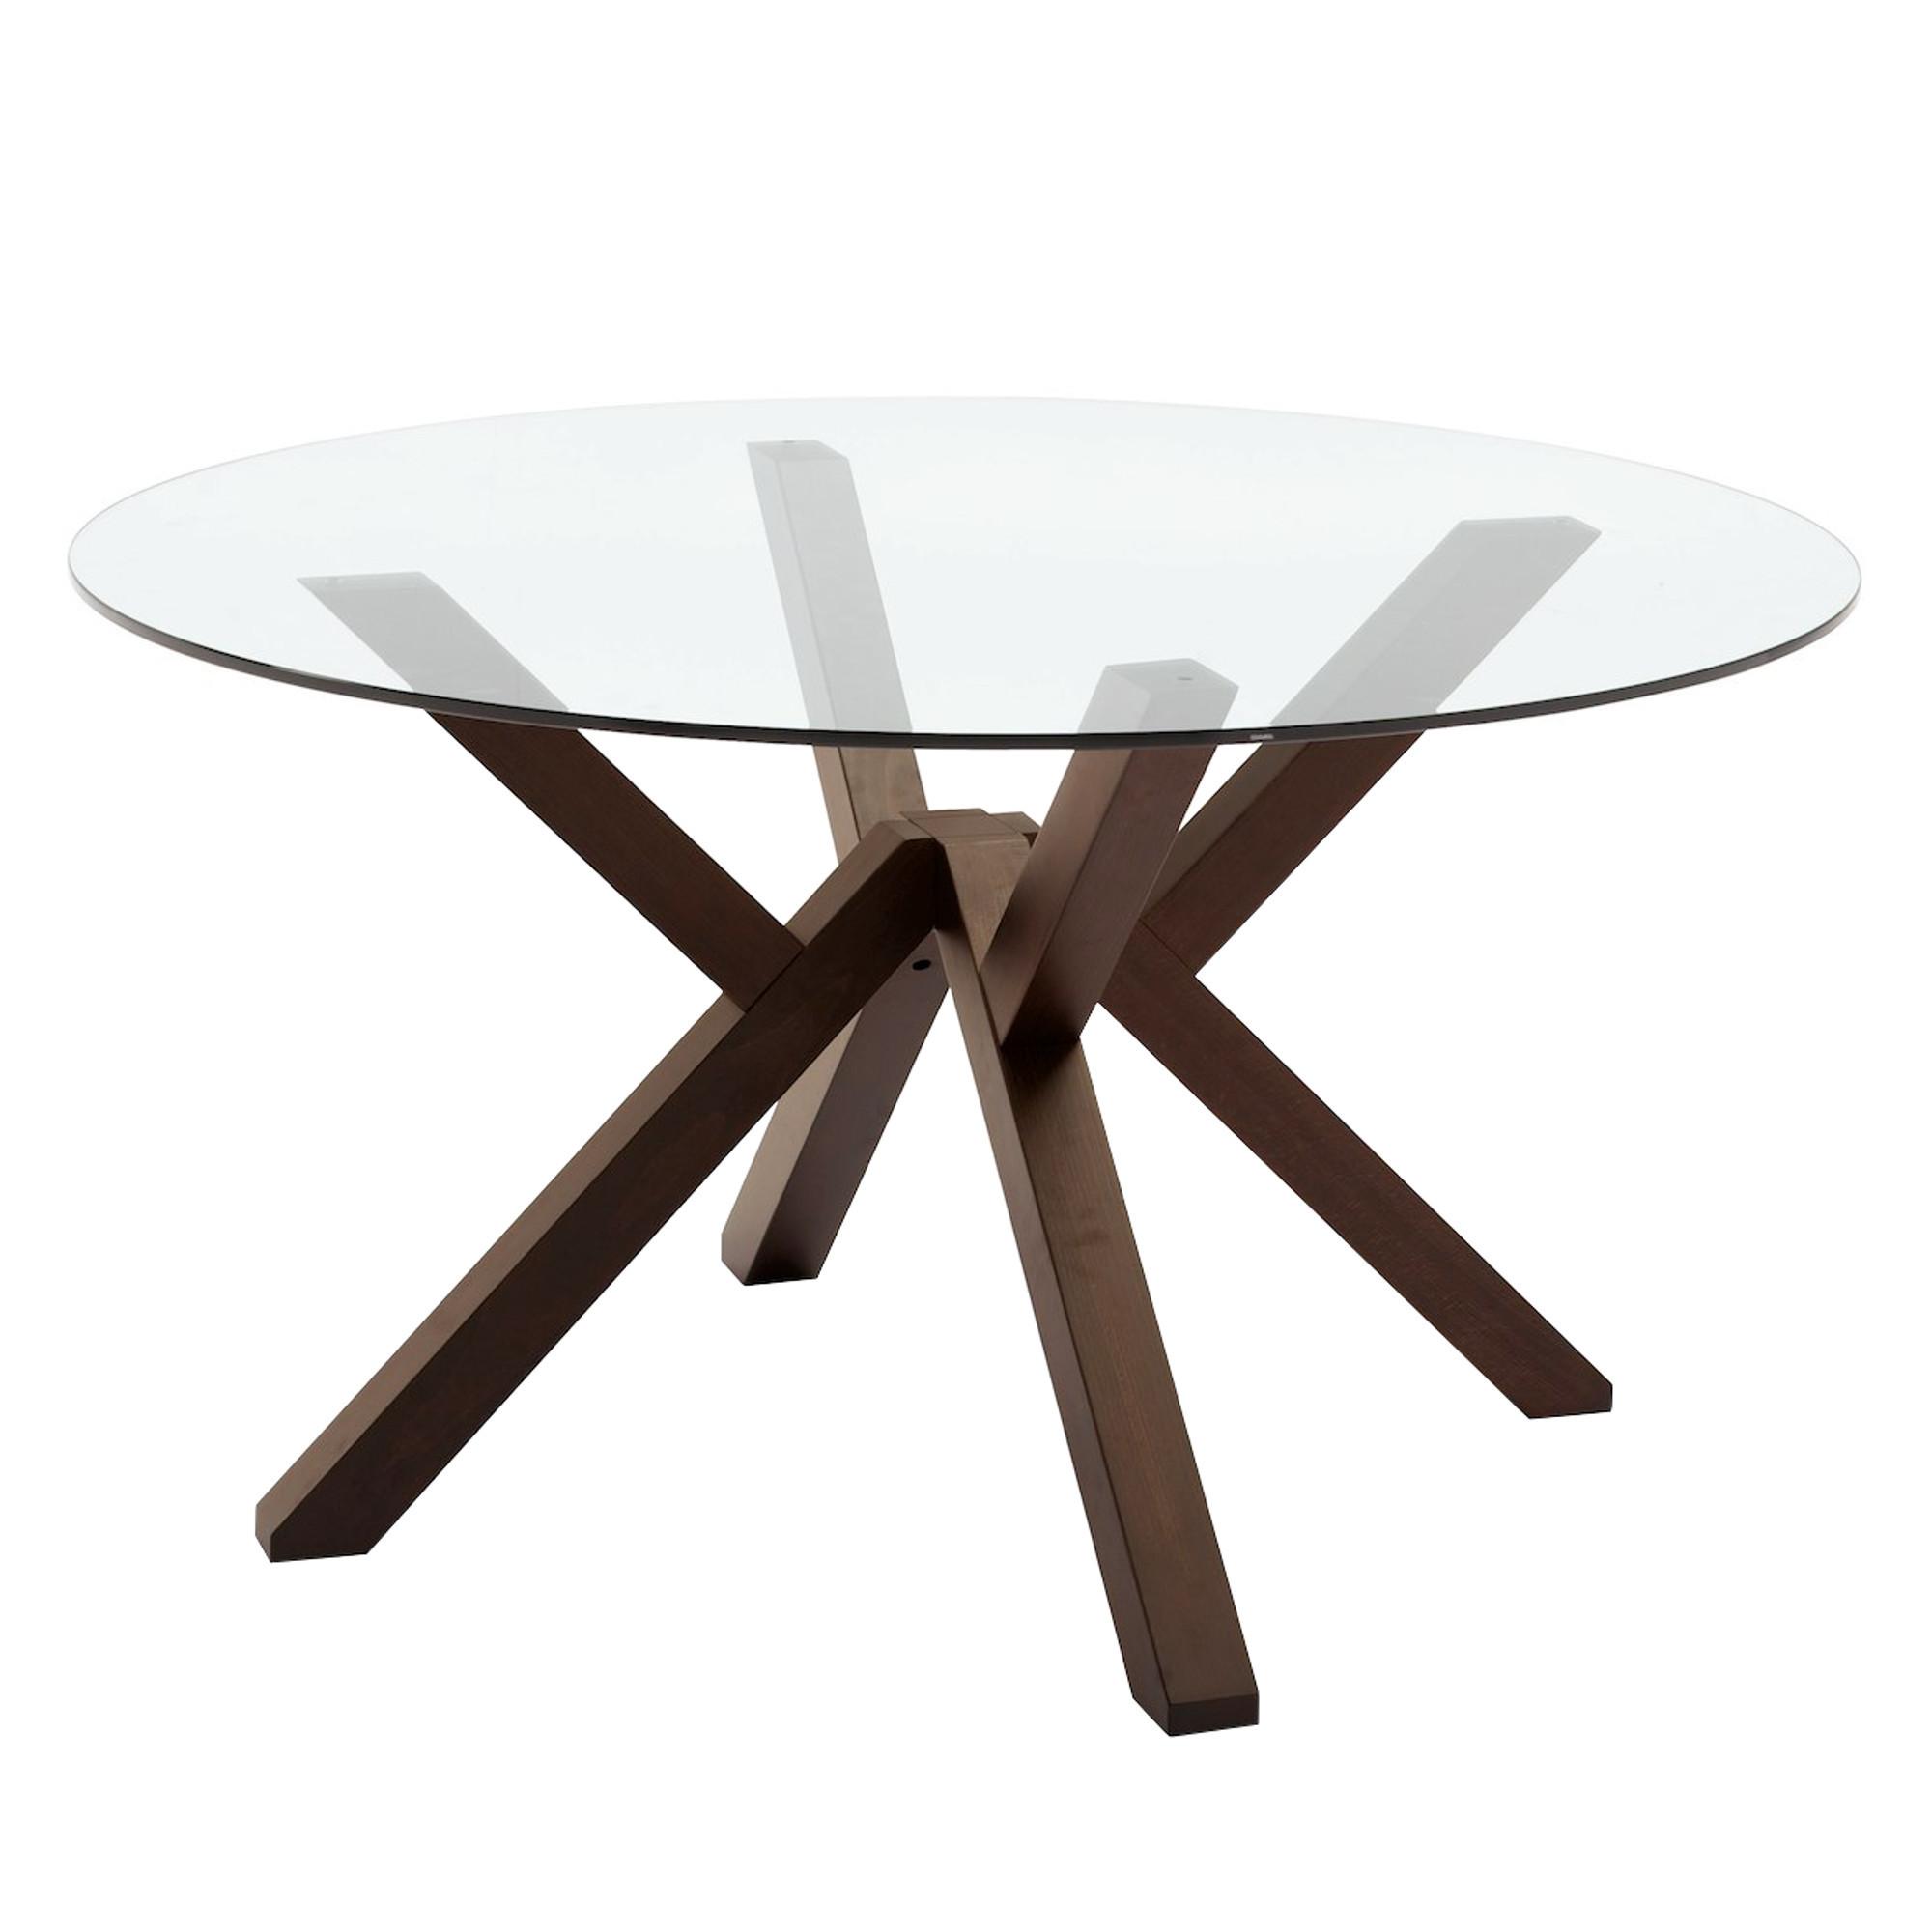 Tavolo Tondo In Vetro.Mikado Round Table Fixed Tables Tables Connubia By